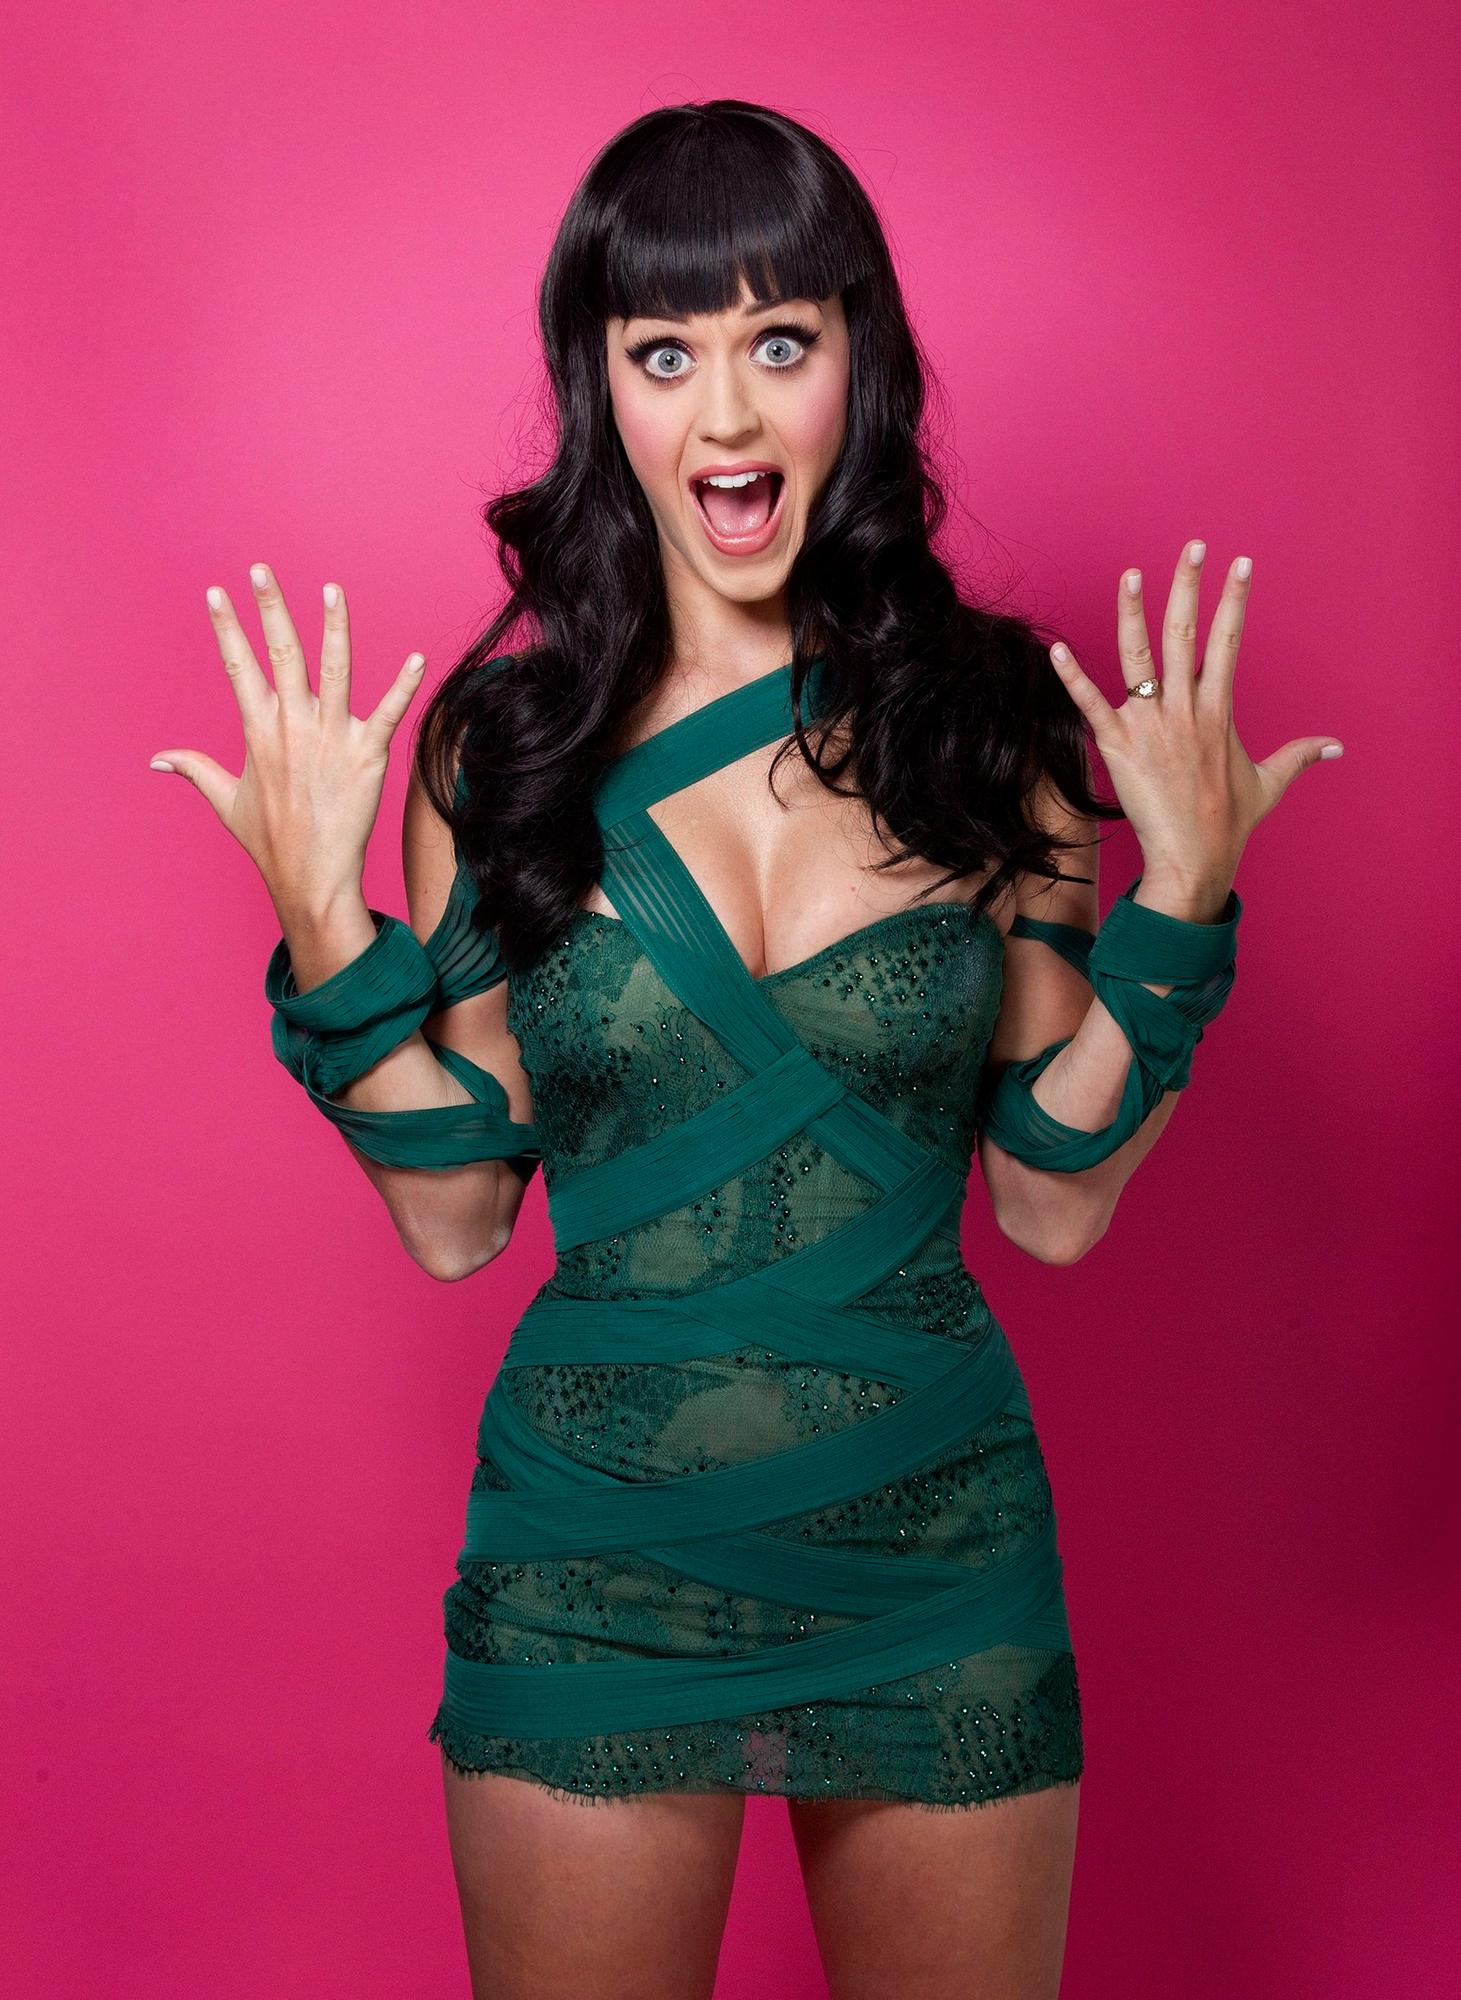 Katy Perry Blowjob